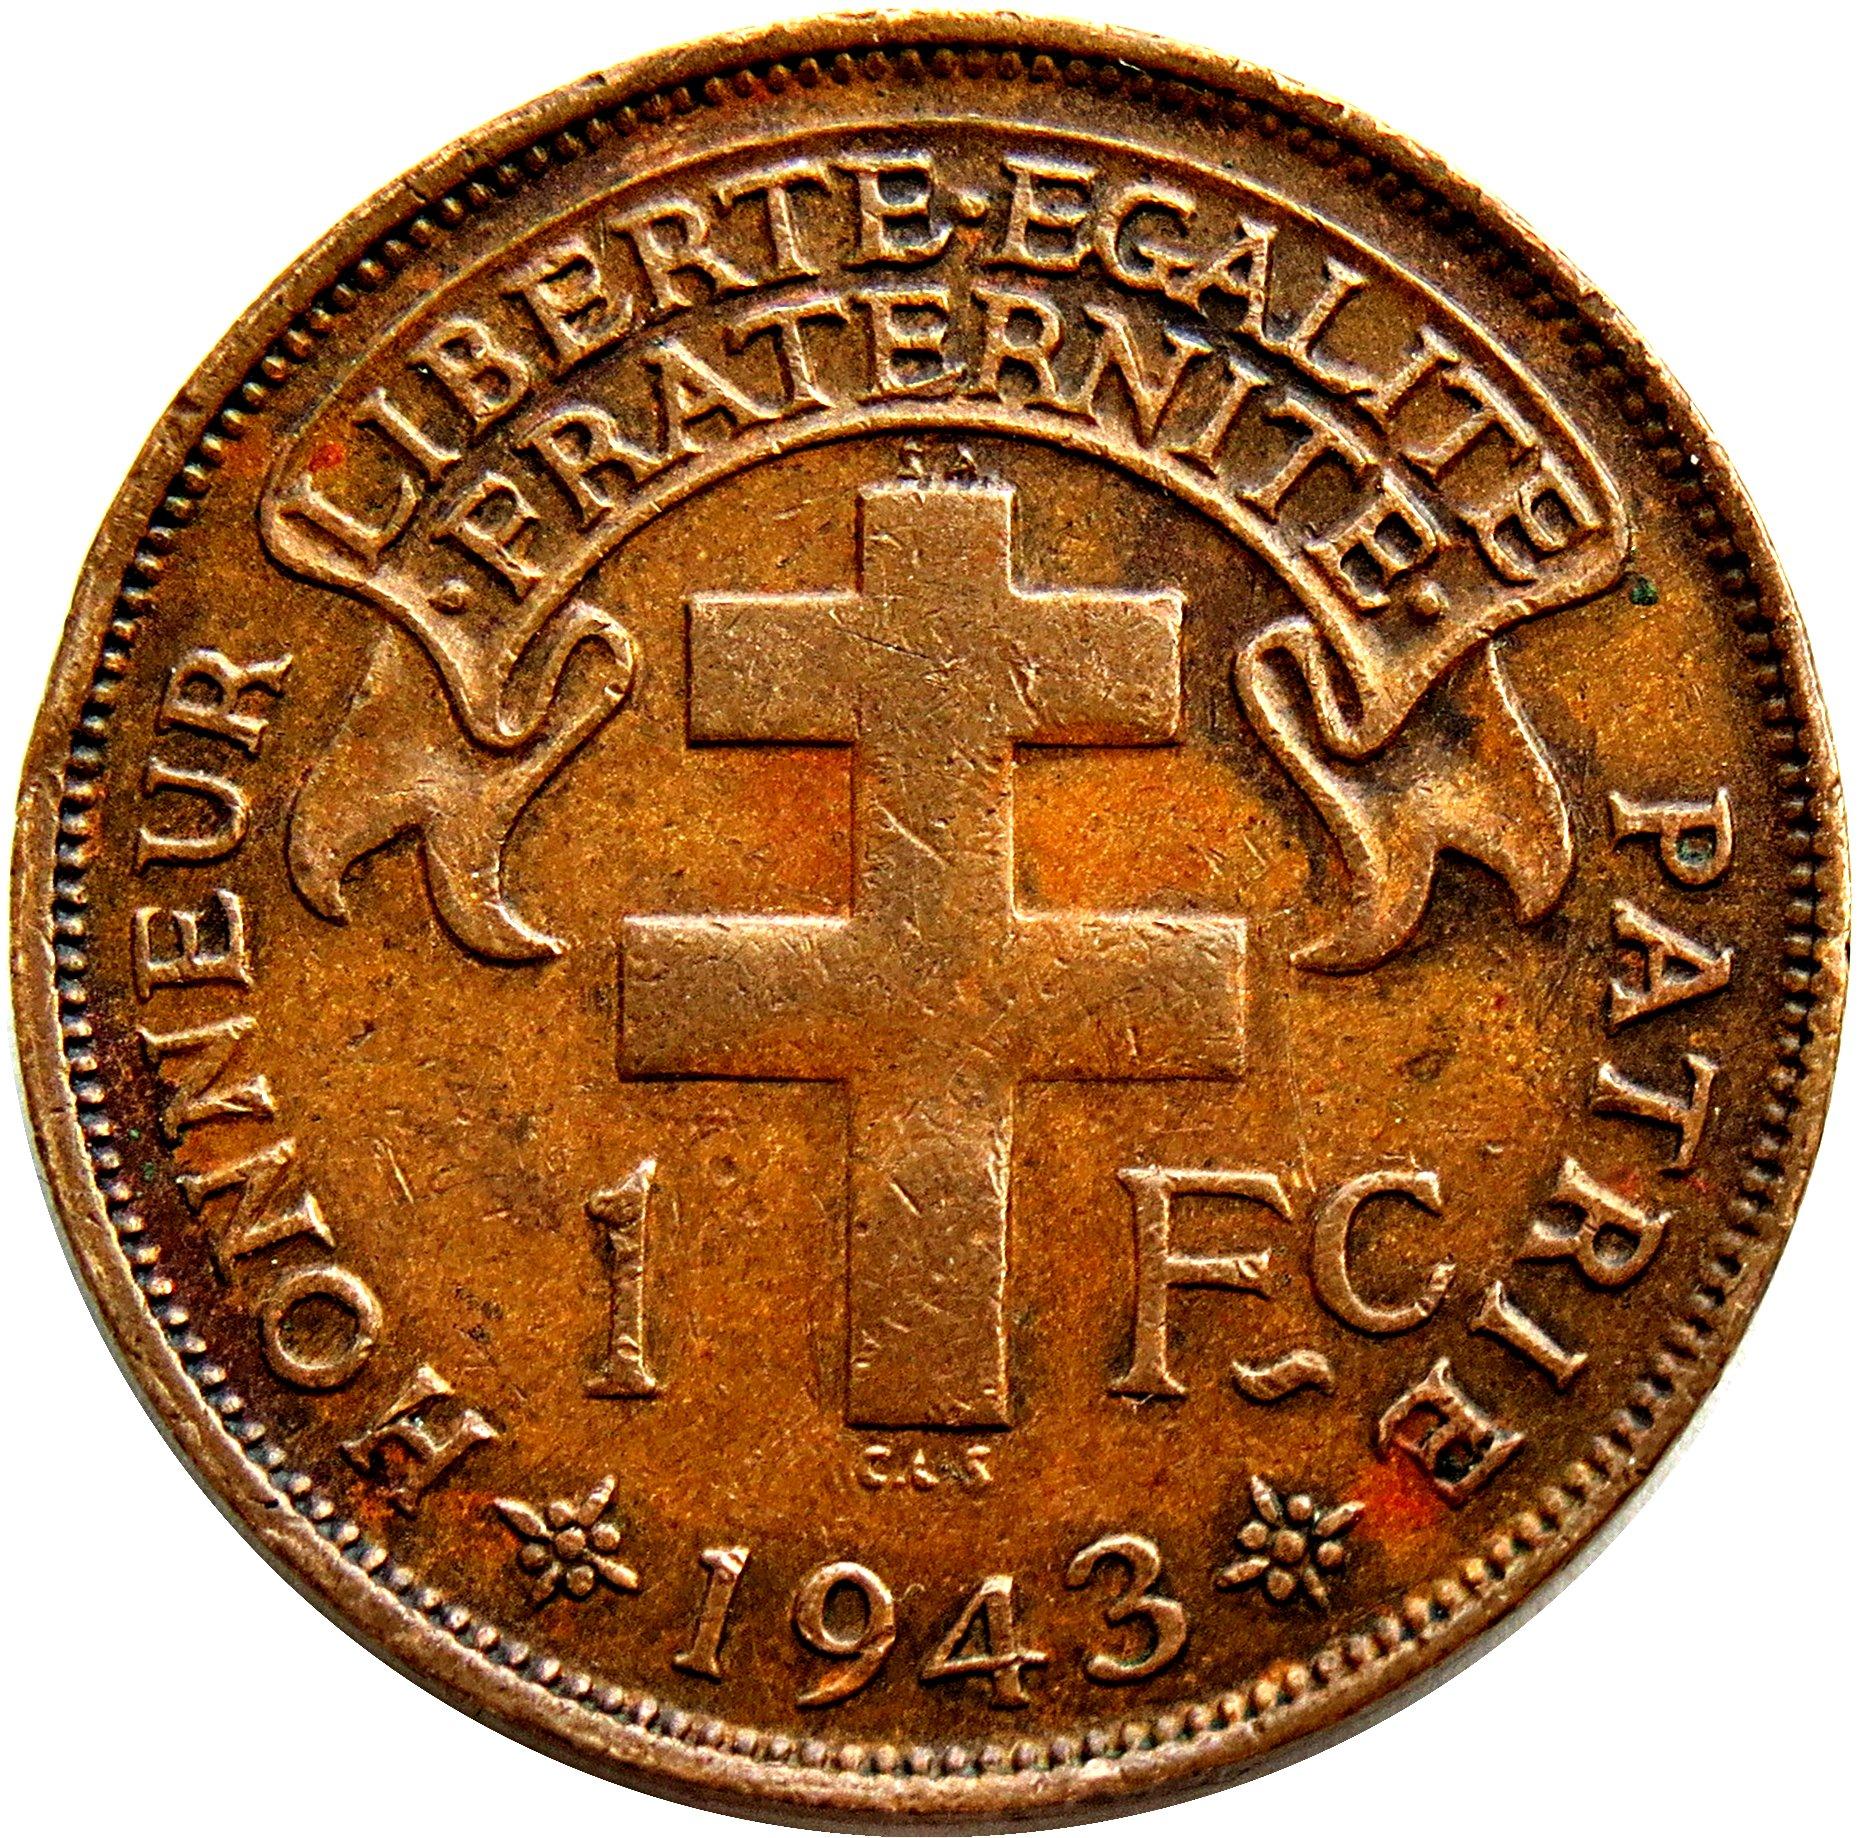 1 Franc Madagascar Numista